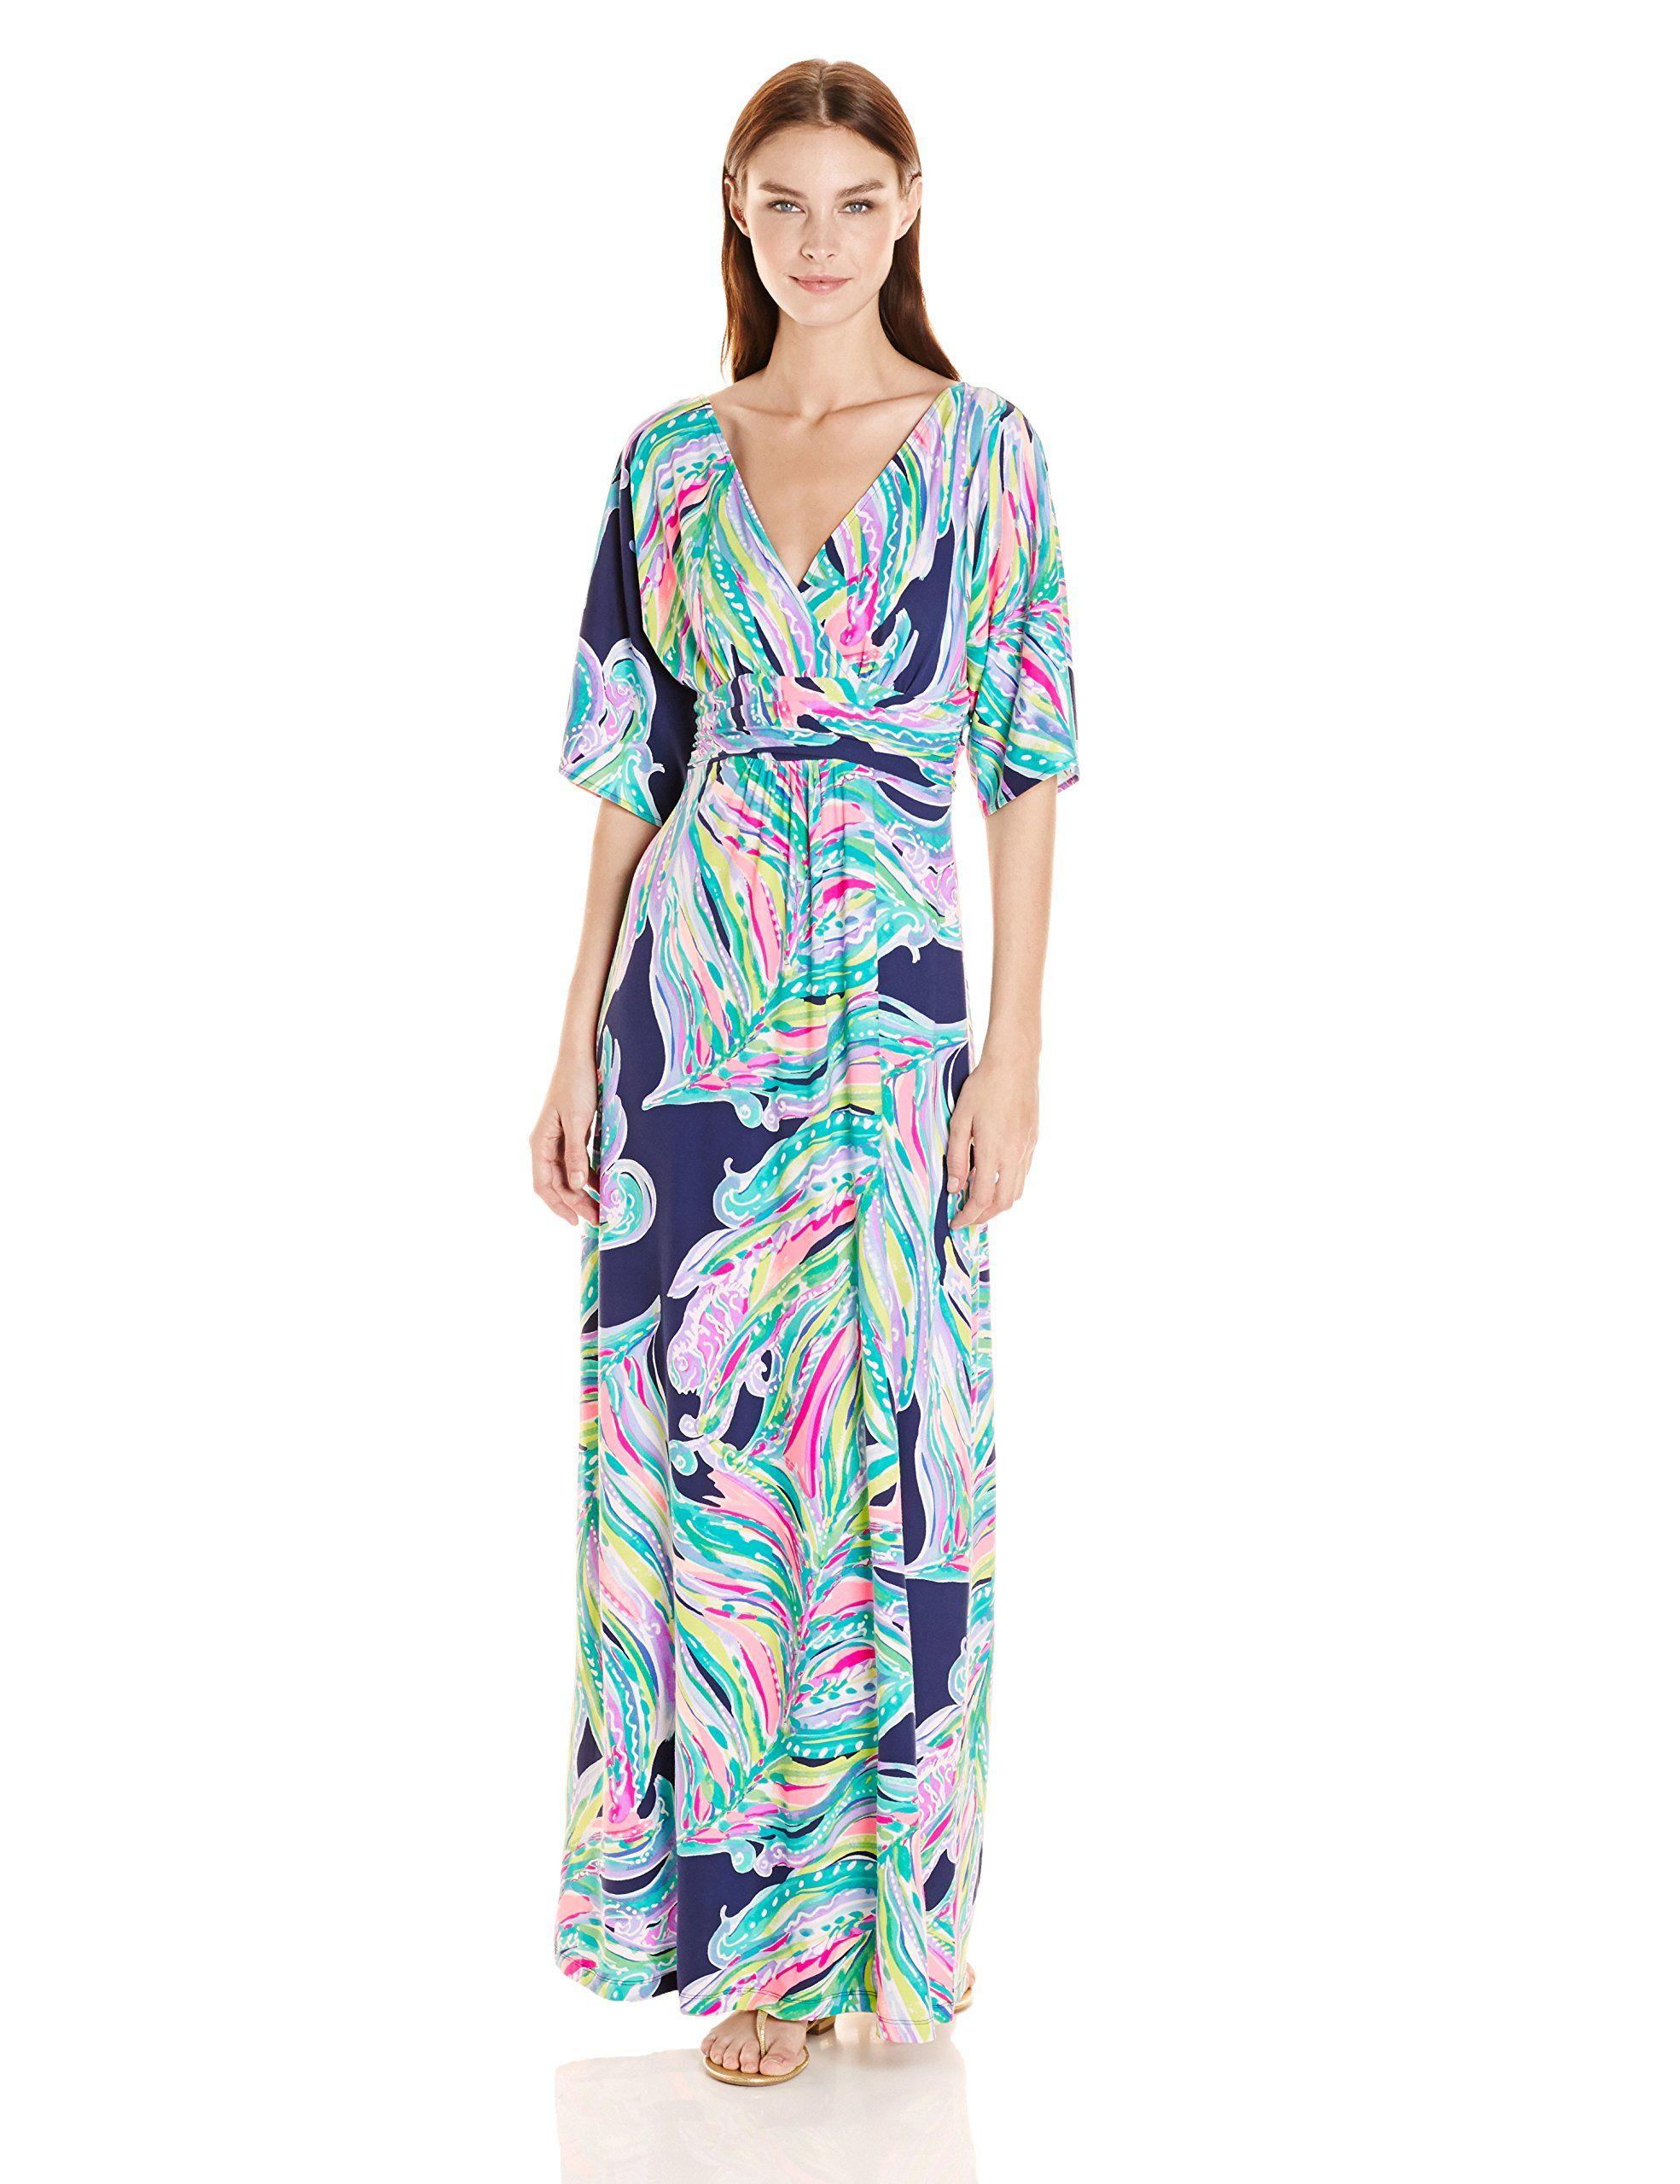 Lilly Pulitzer Women\'s 23900 : Parigi Maxi Dress | Styles Fashion ...